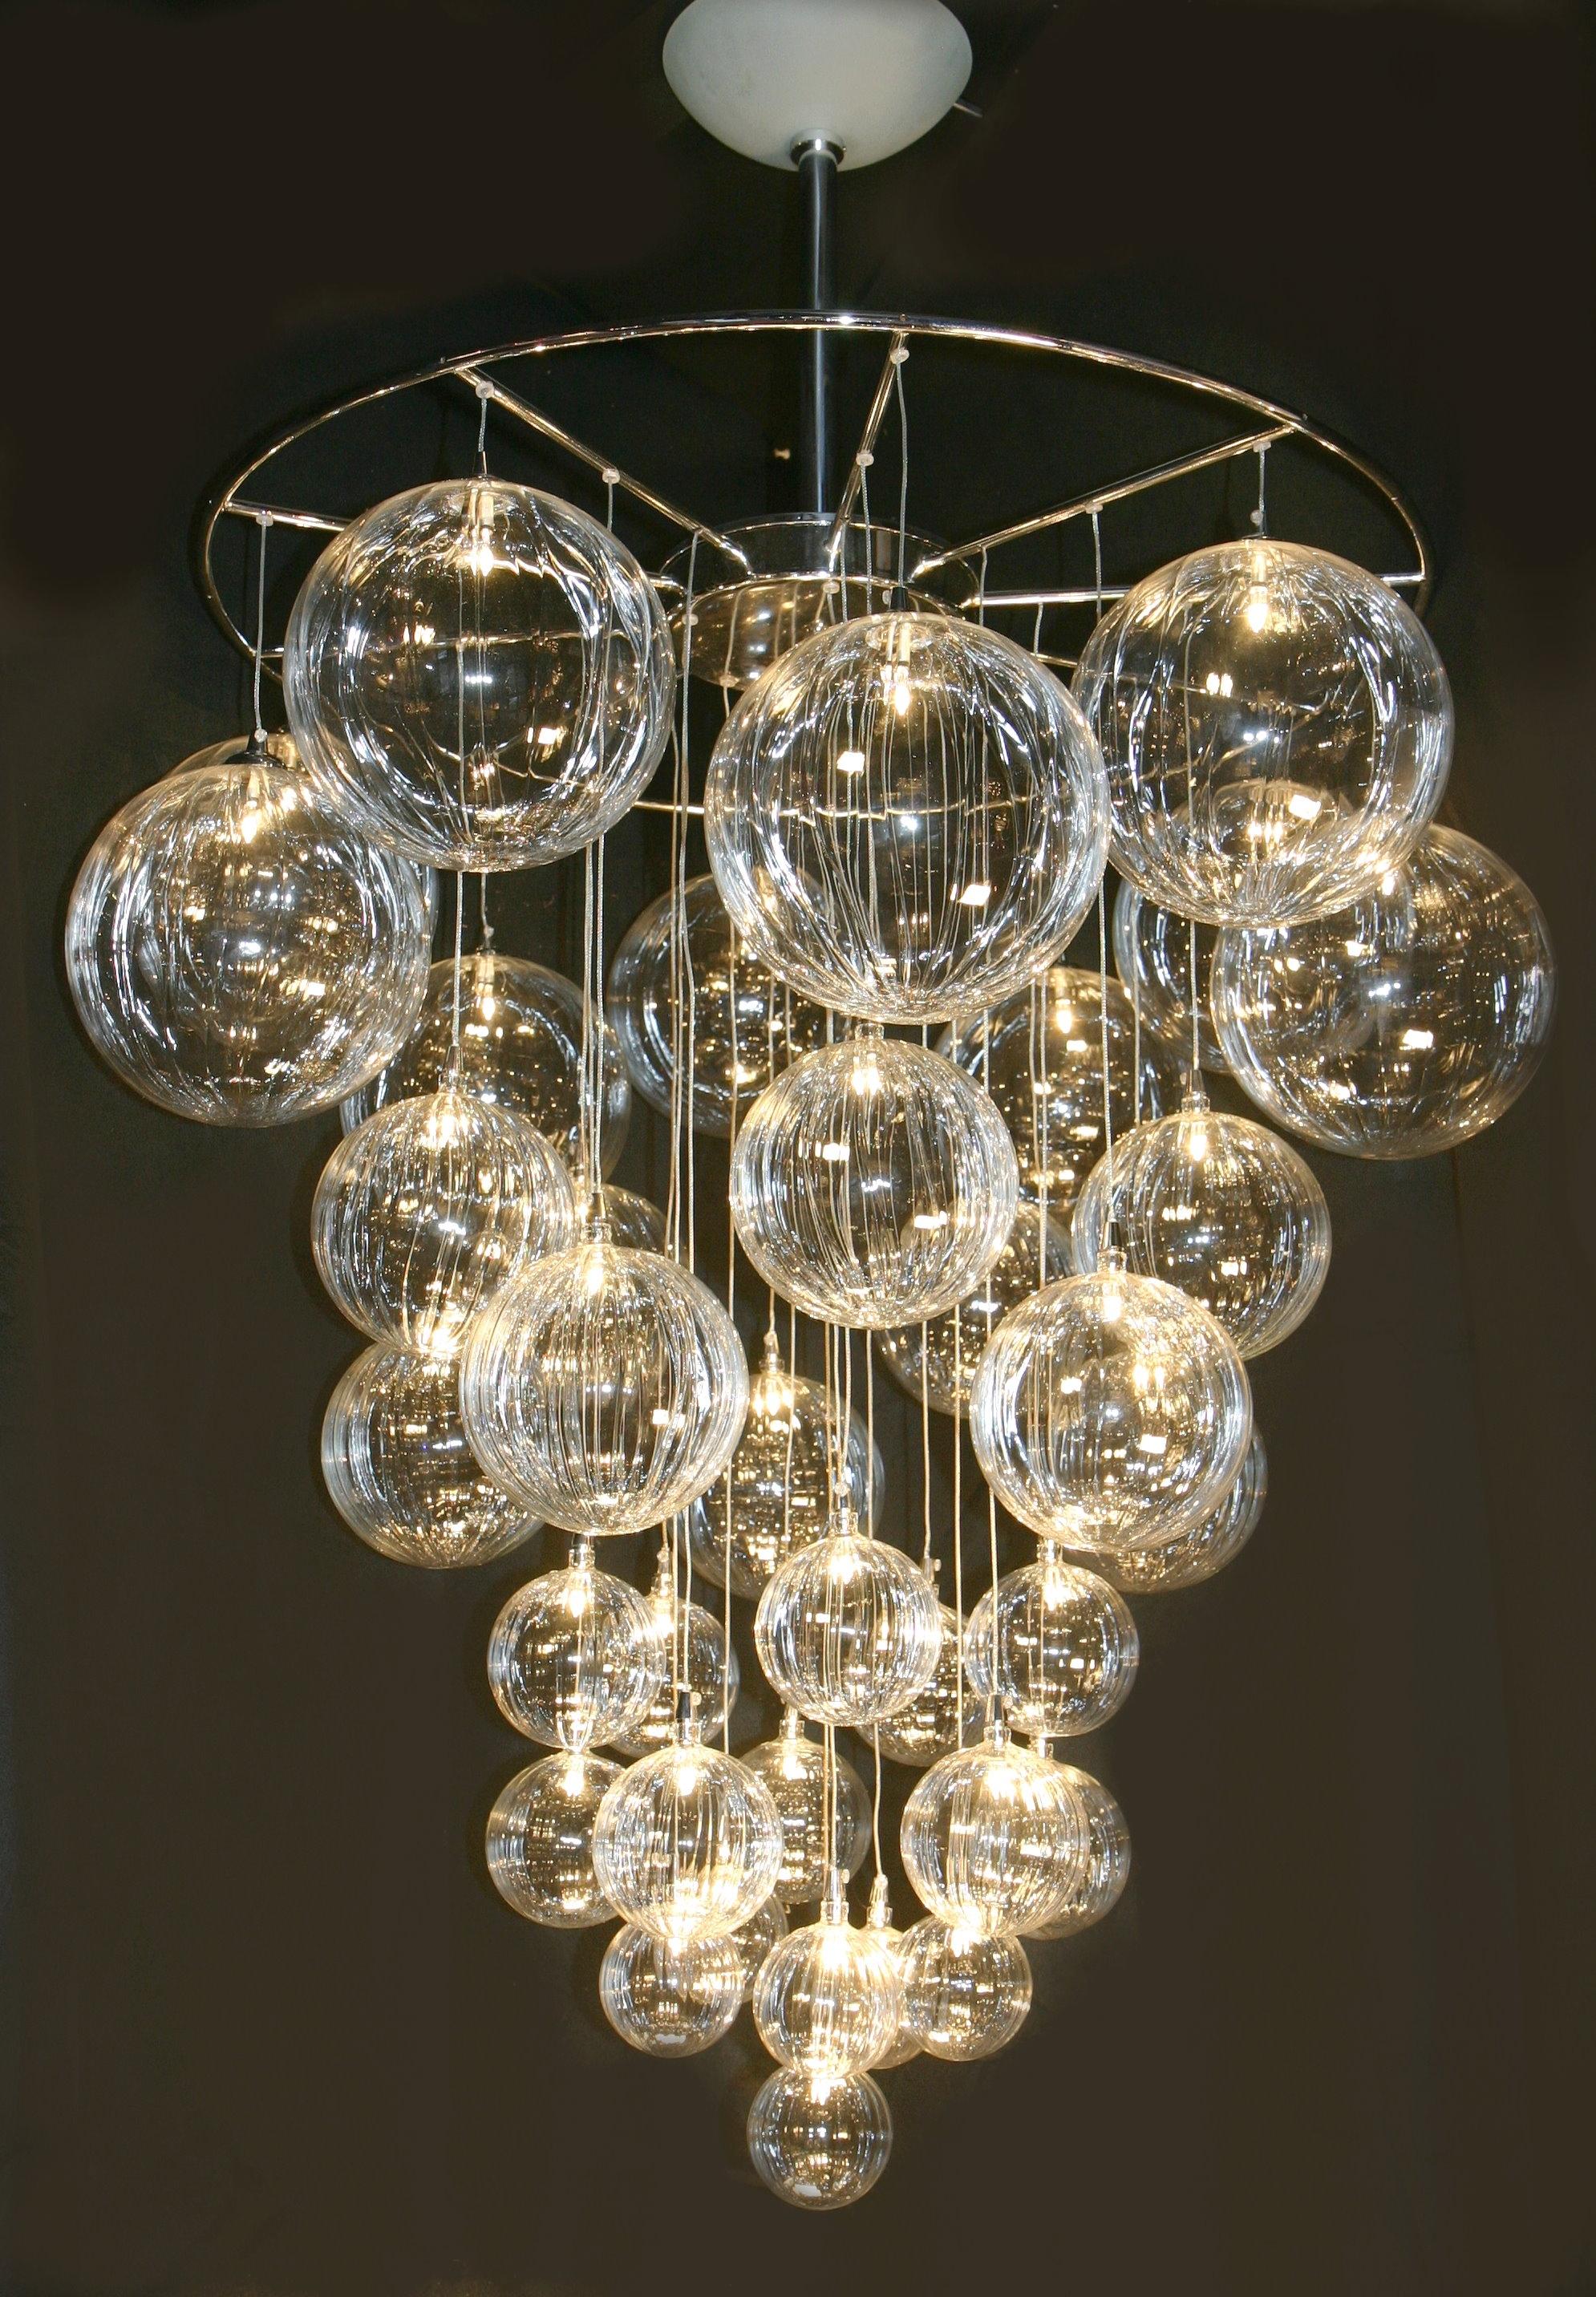 53 Modern Chandelier Lighting Modern Contemporary Crystal Pendant Regarding Contemporary Chandelier (#3 of 12)